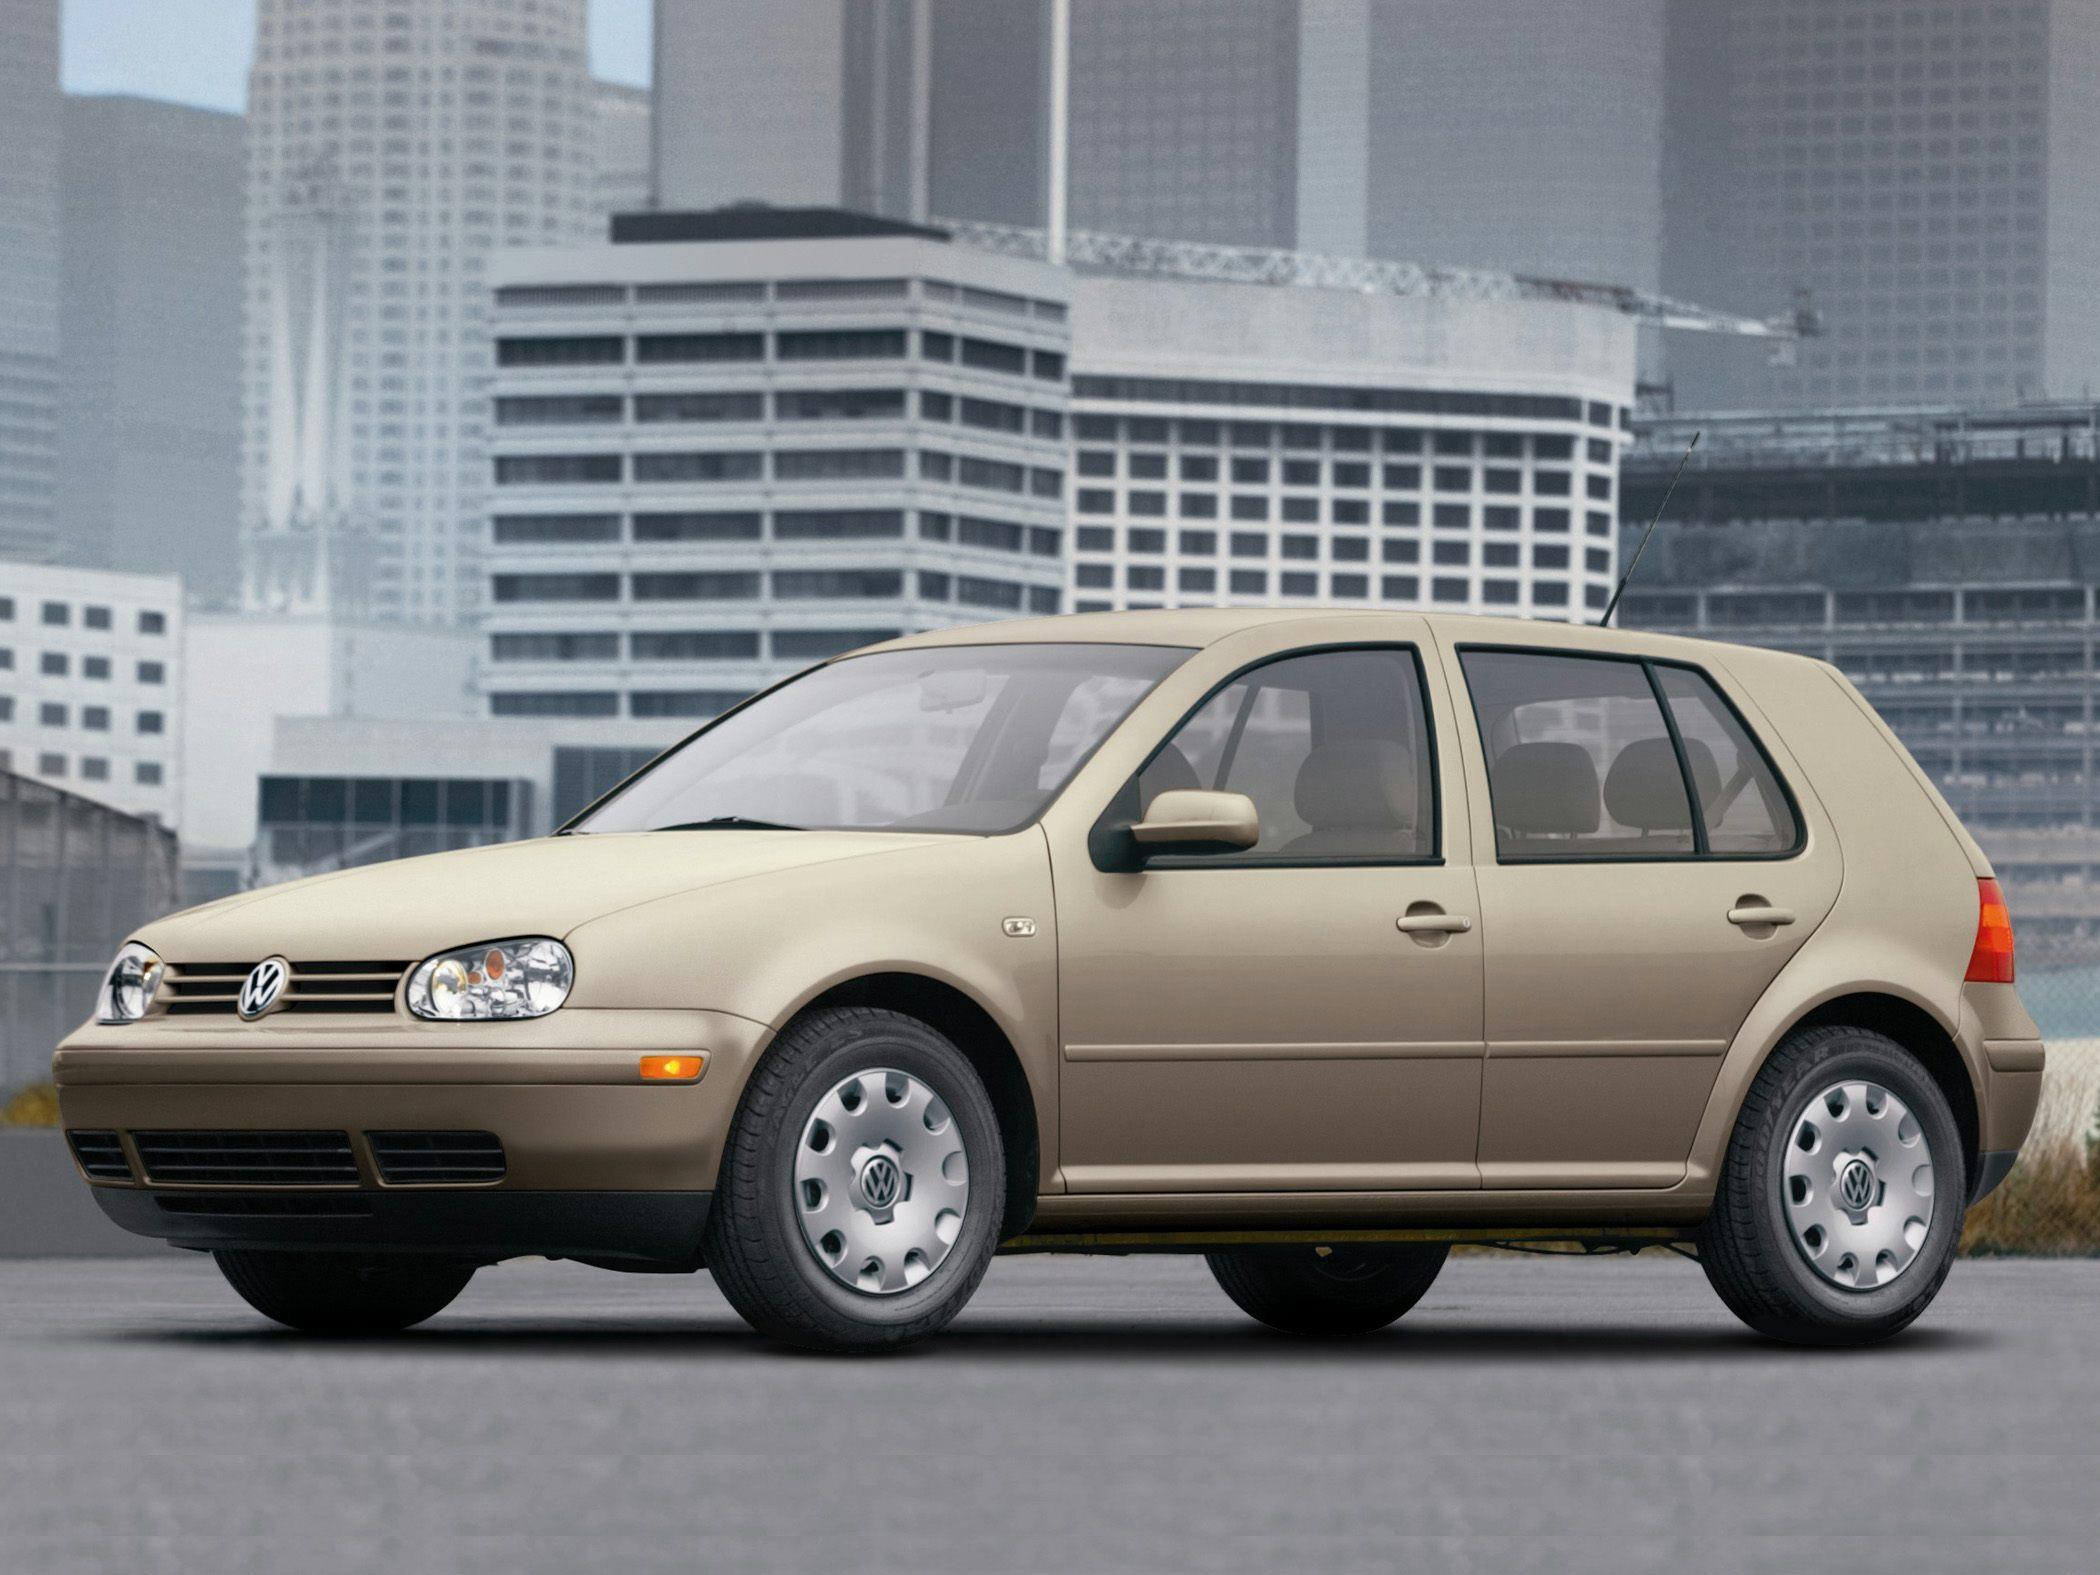 Volkswagen Golf IV — описание модели